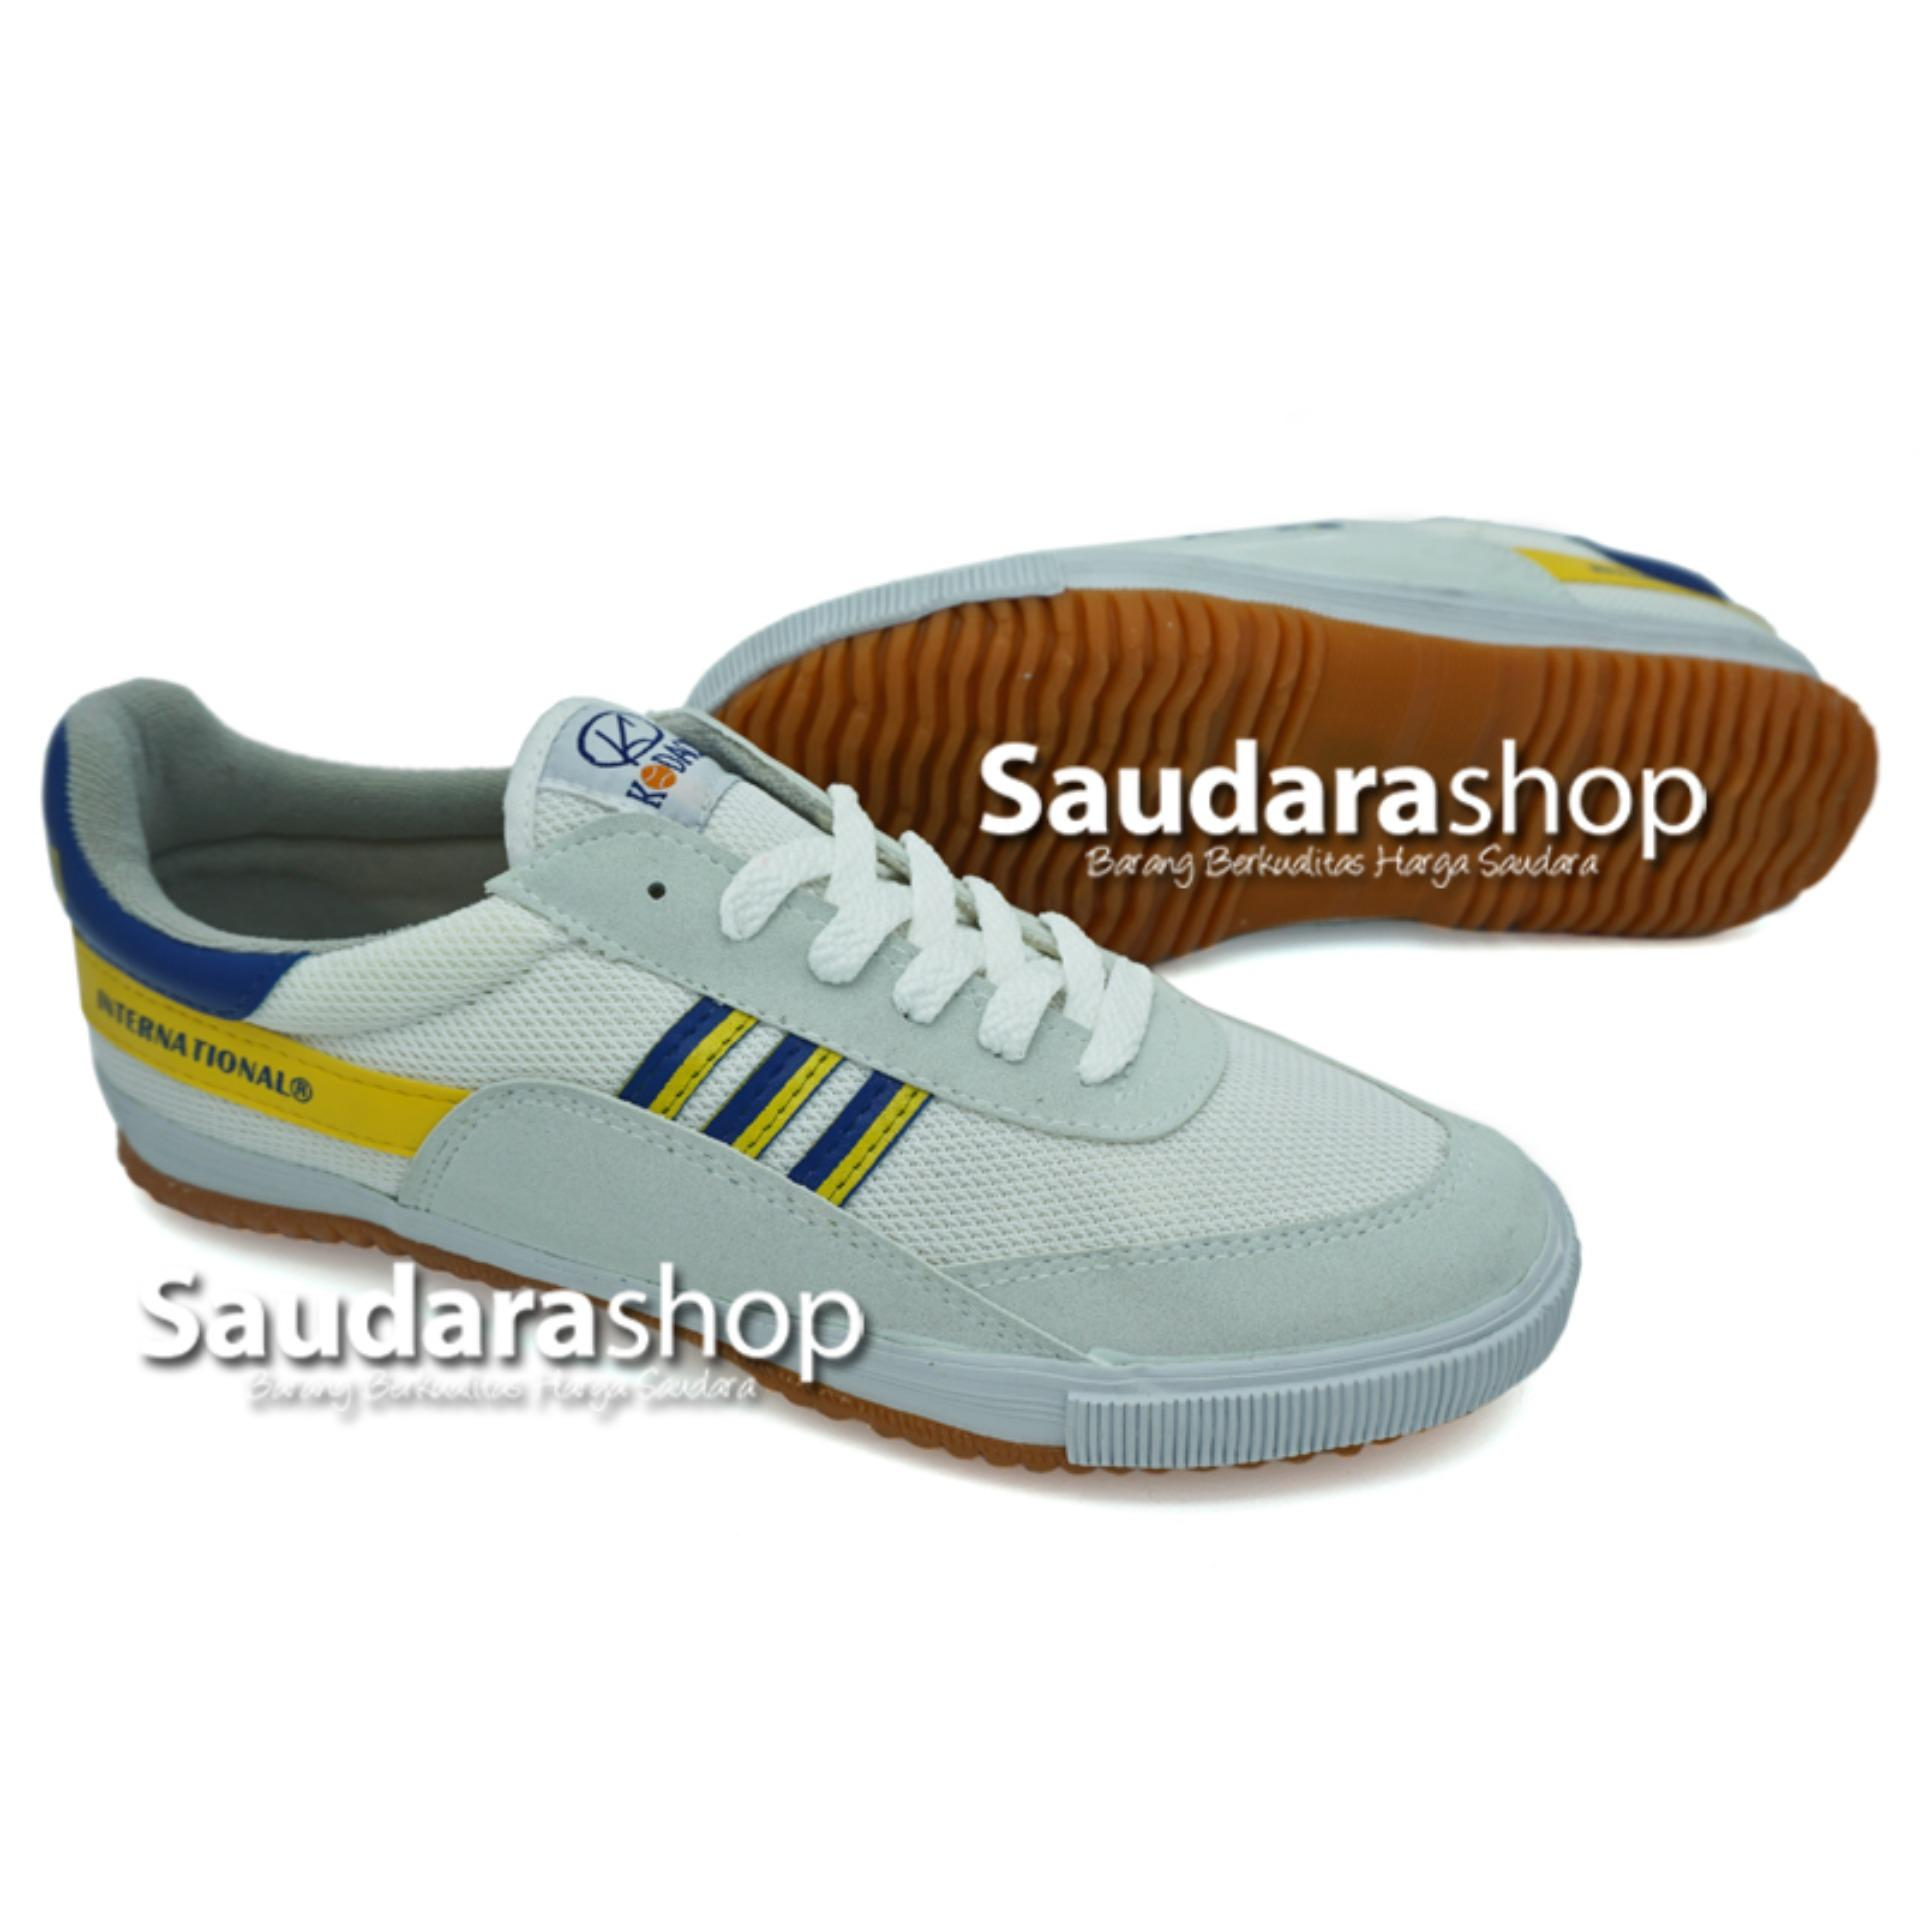 Kodachi 8116 Sepatu Capung Putih Biru Kuning [34-45] / Sepatu Capung